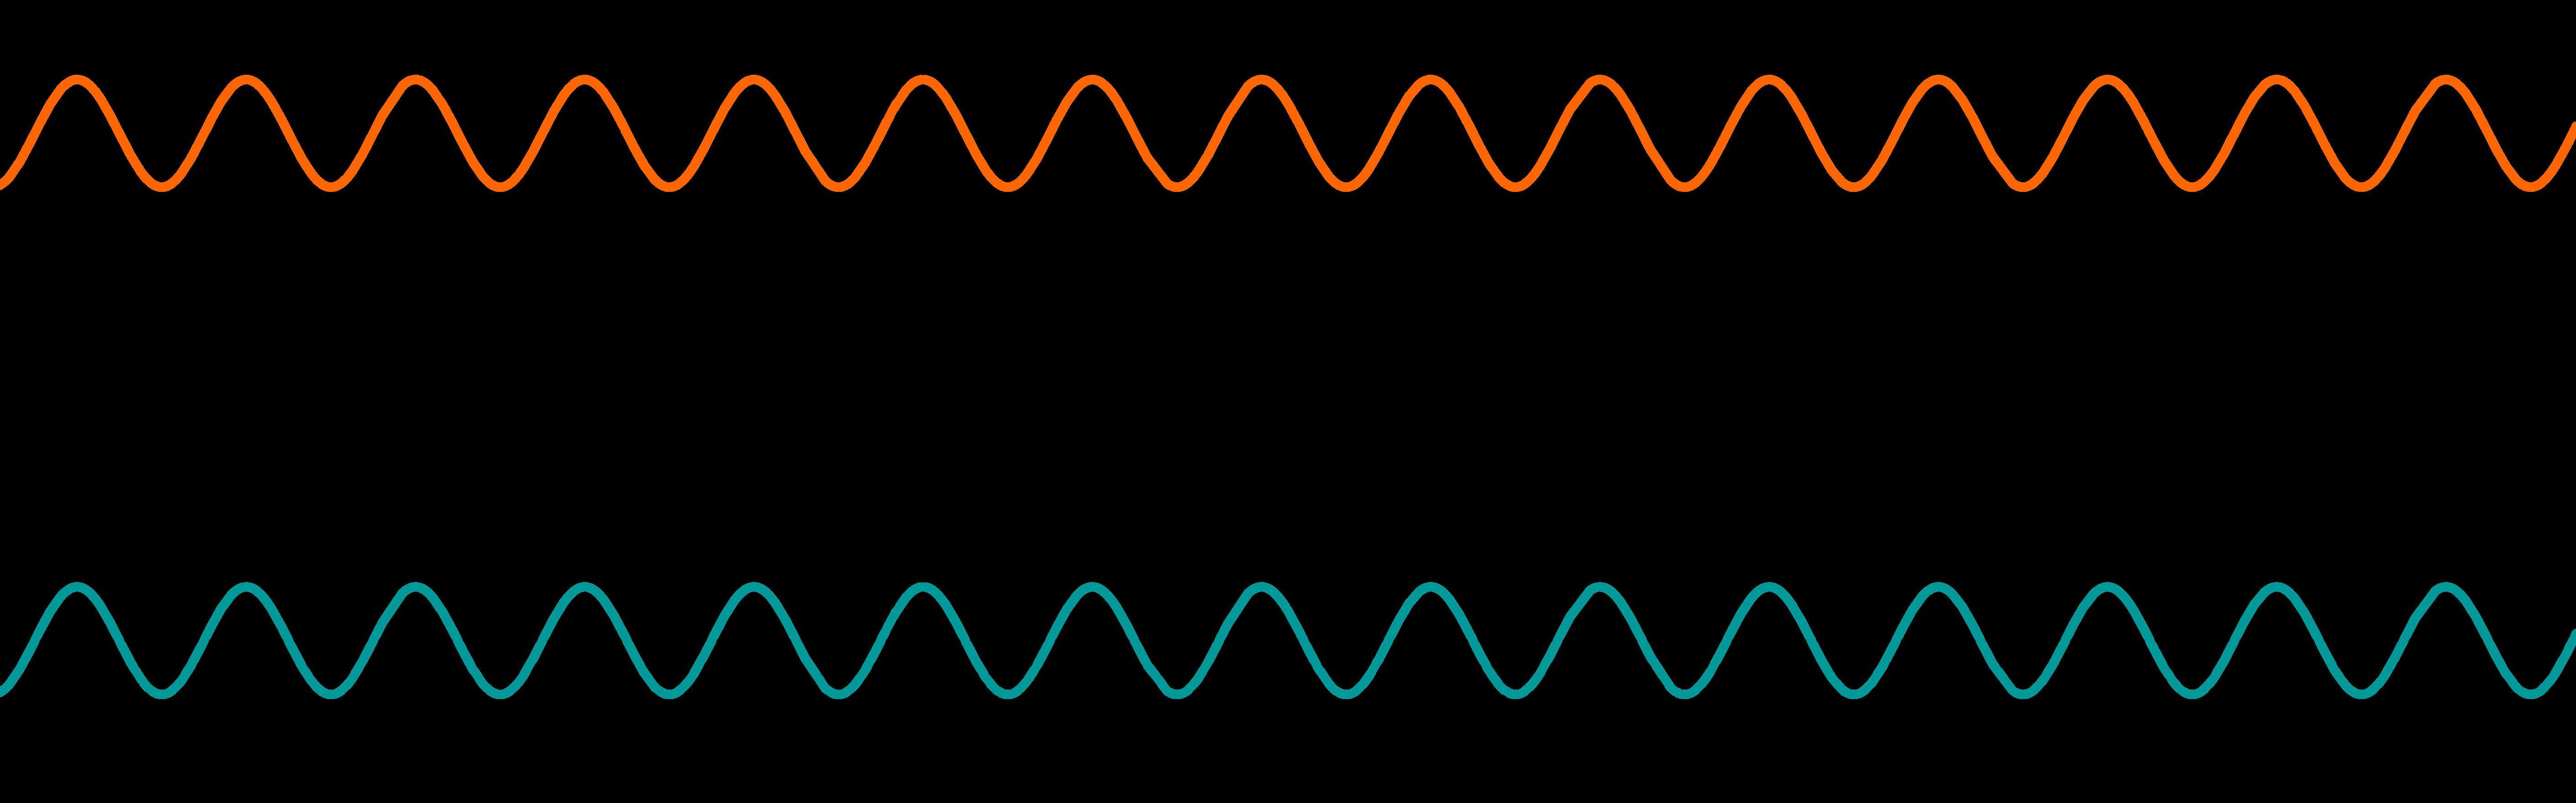 Graph zu Kosinus